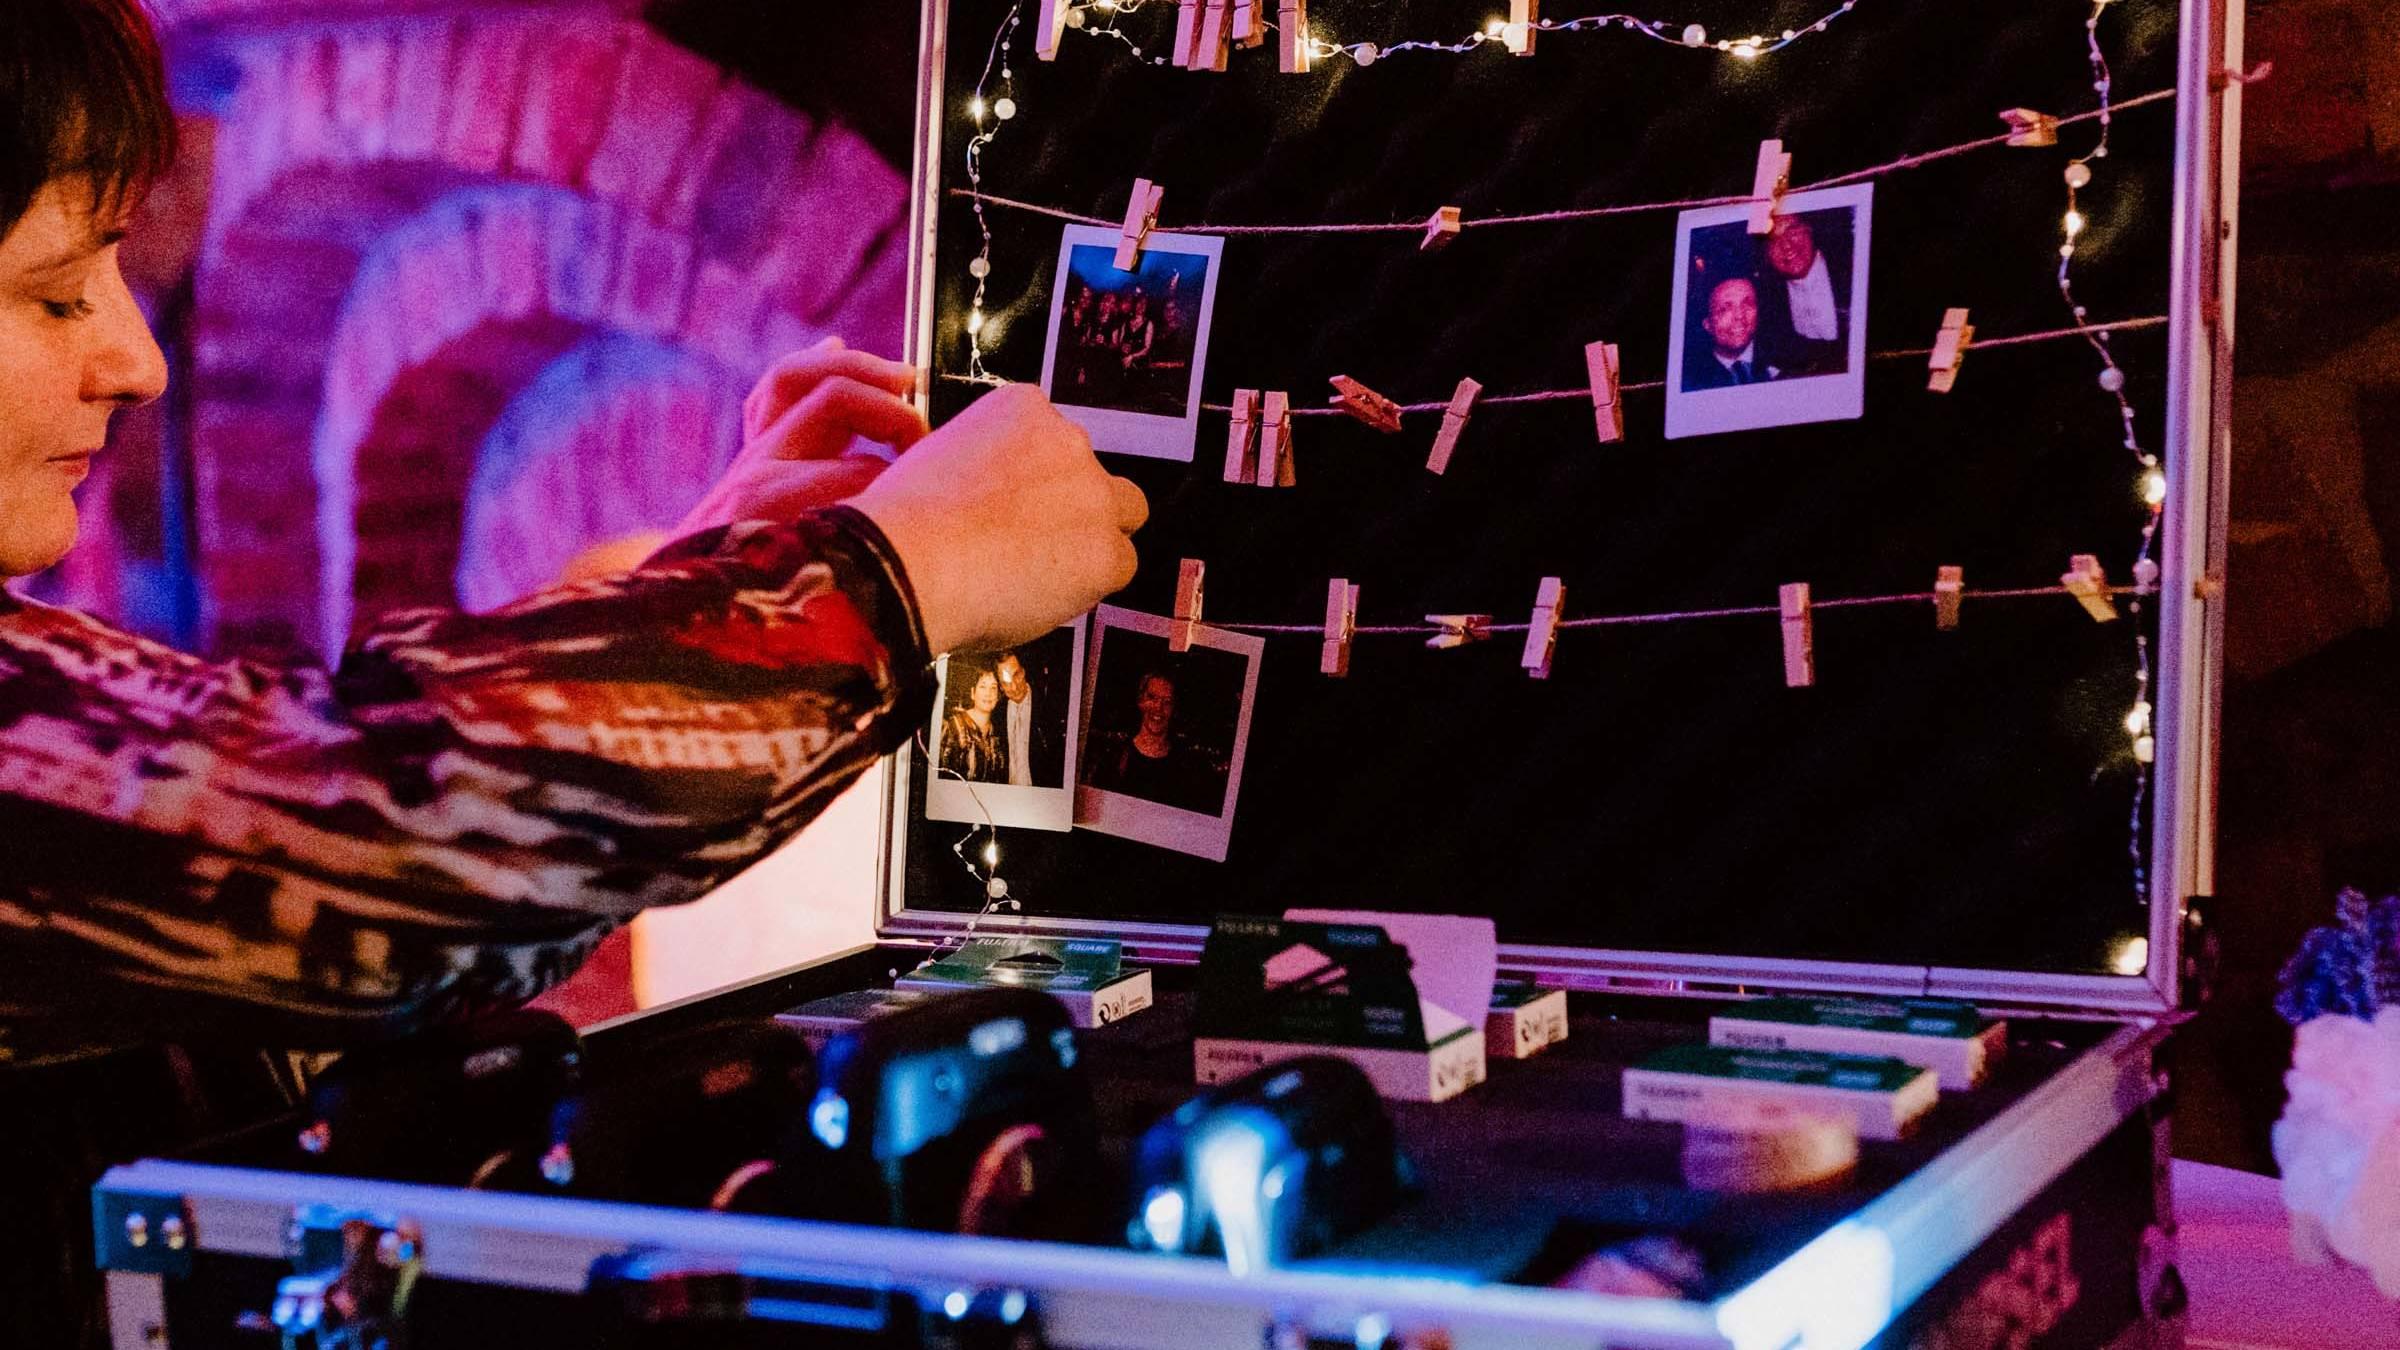 Hamburgfeiert |Partner |Knipsel |Polaroid |Kamera |Mieten |Hochzeit |Polaroid |Fotograf |Set |Event |Mieten |Instax |Leihen |Event |Hochzeit |Sofortbildkamera